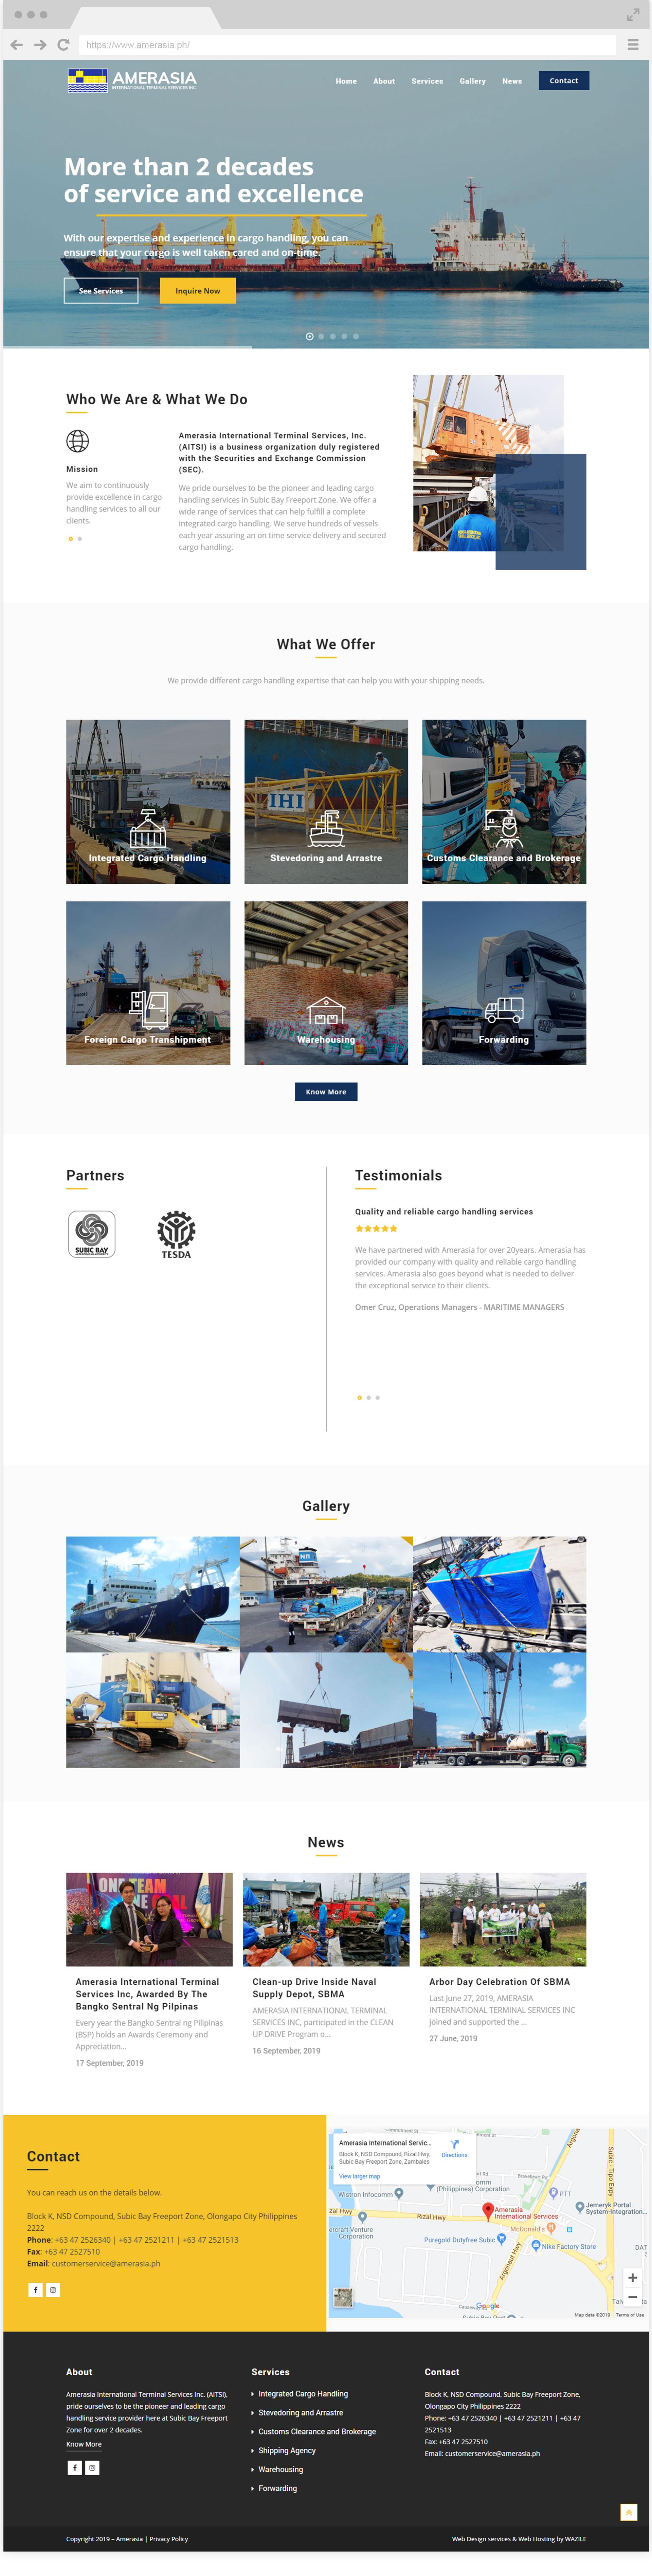 Amerasia Homepage